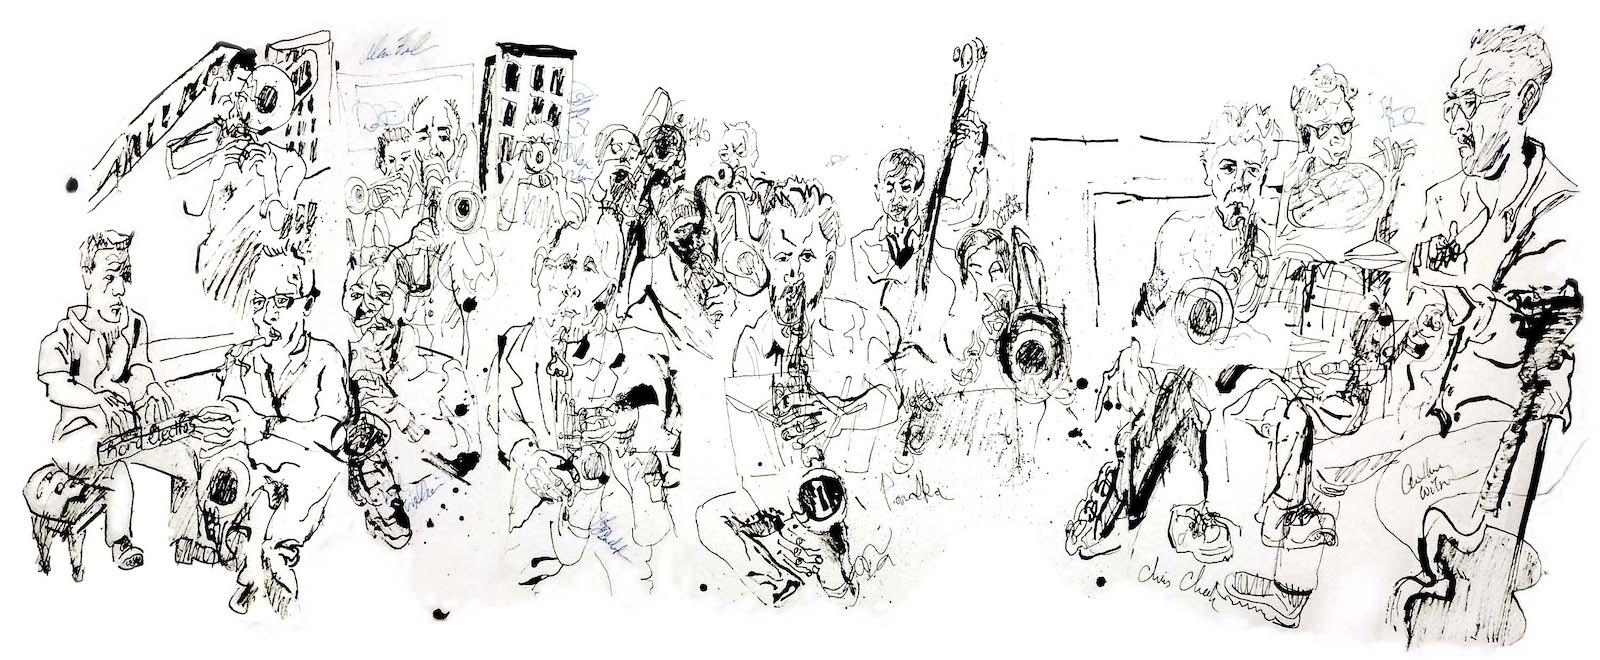 Alan ferber big band at jazz gallery 2012